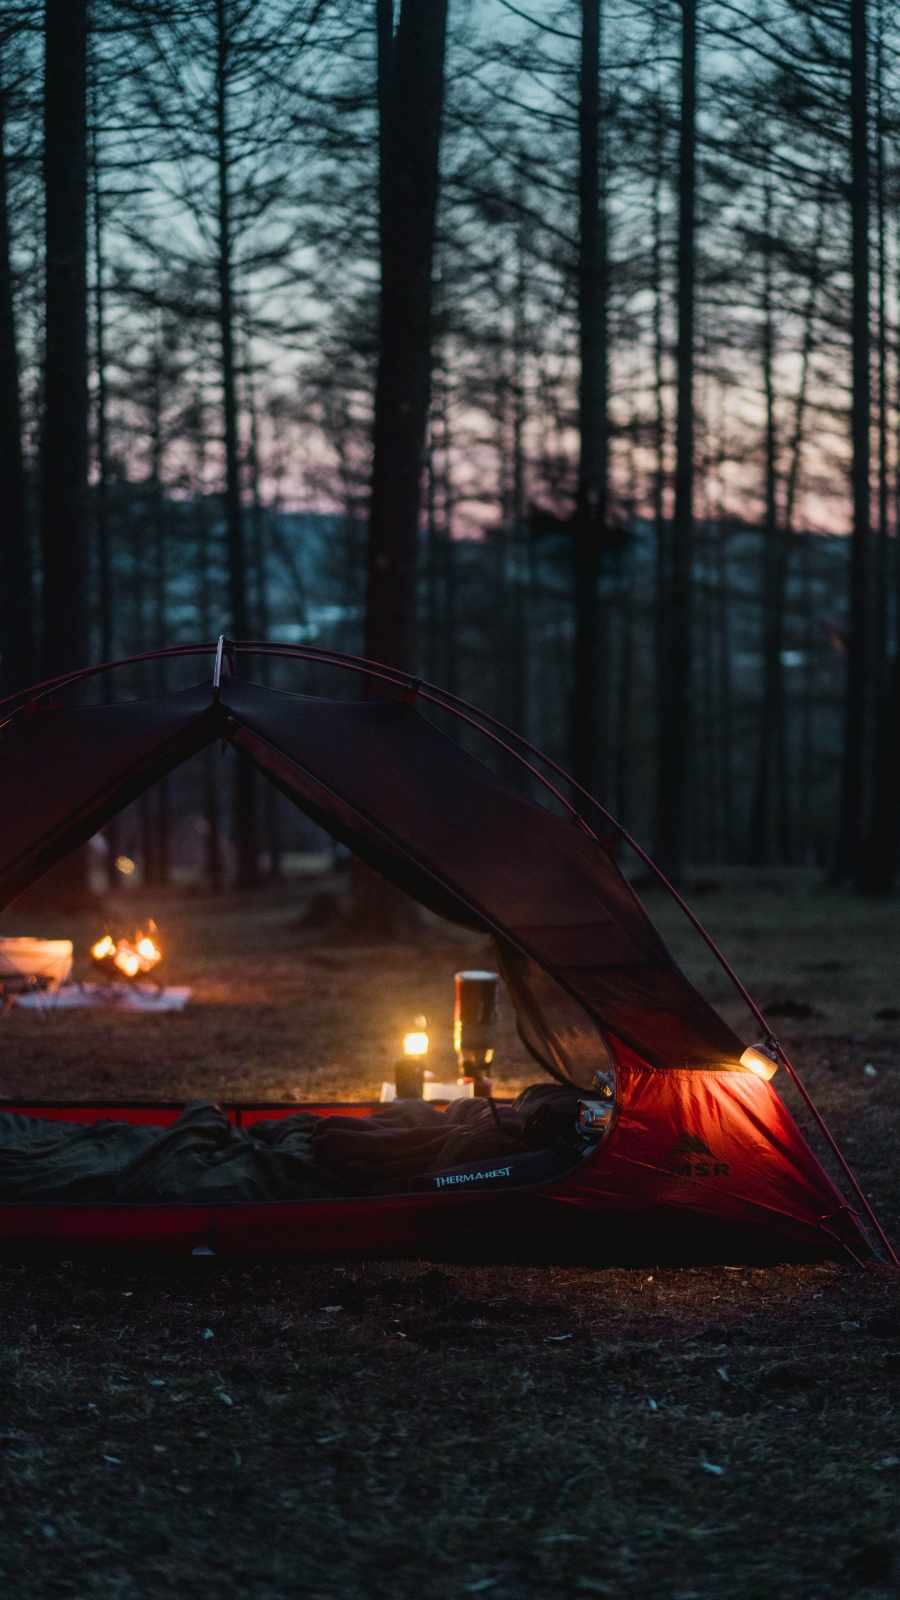 Camping Tent iPhone Wallpaper